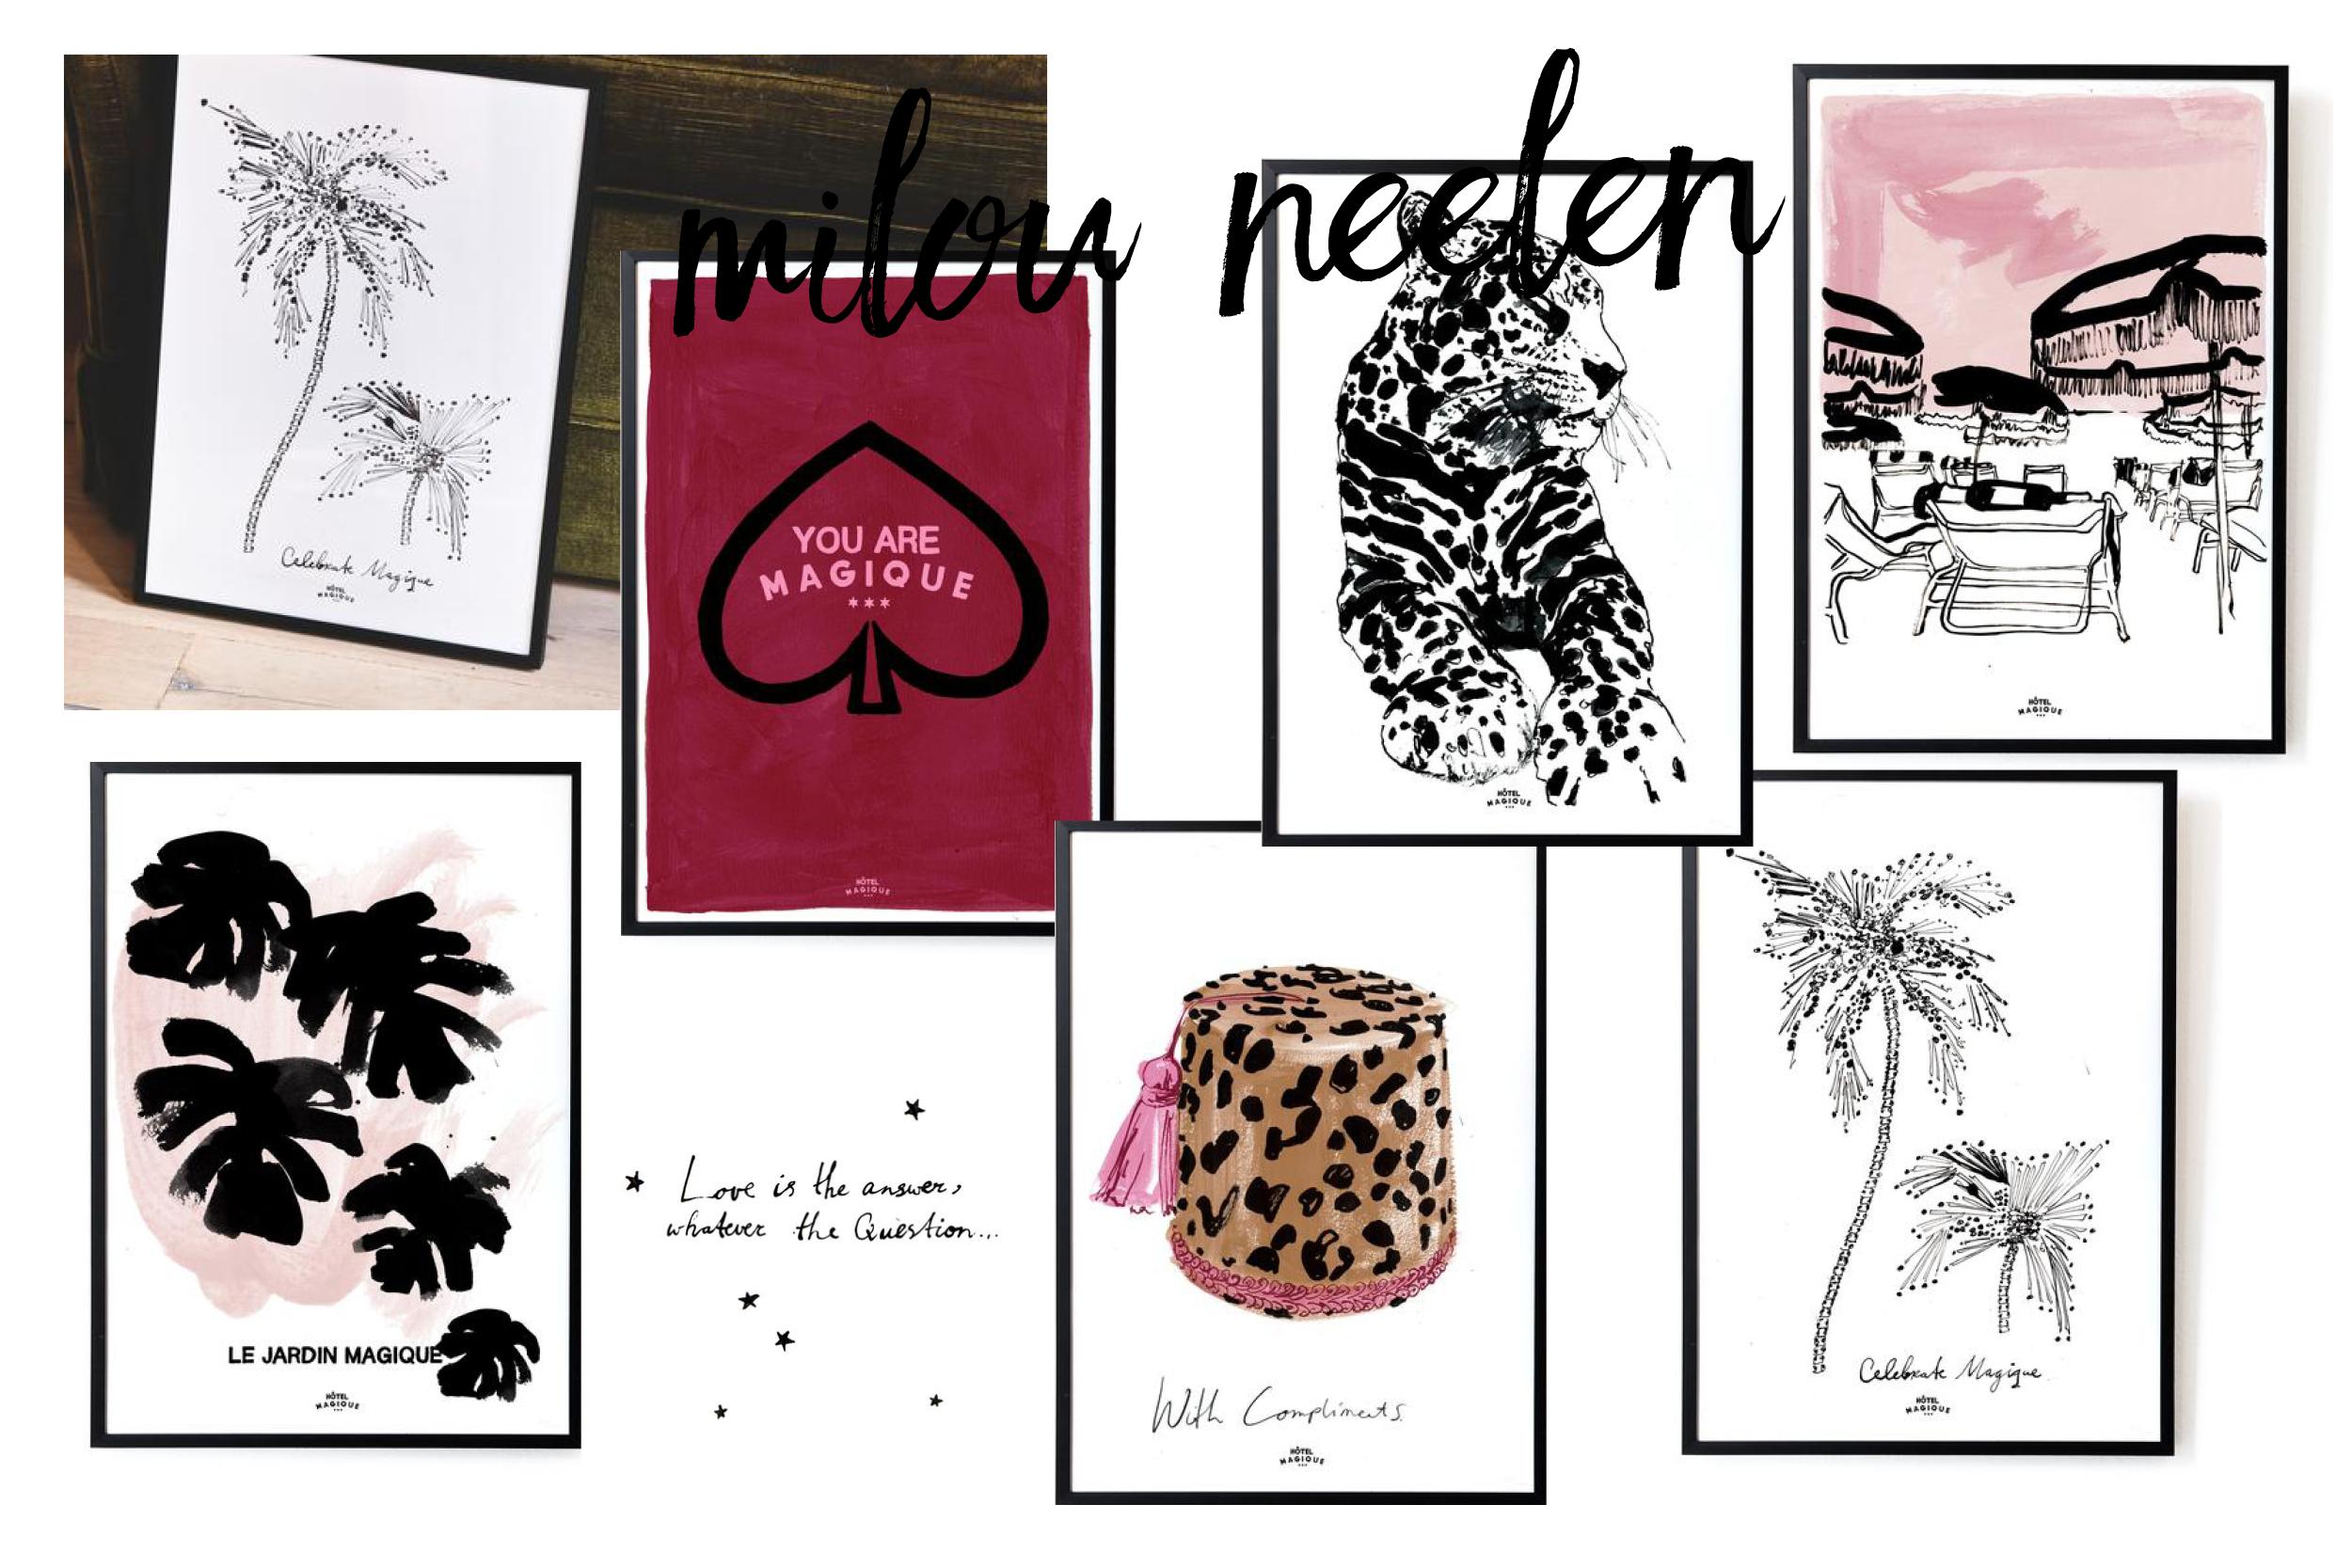 Milou Neelen / Featured Foxycheeks